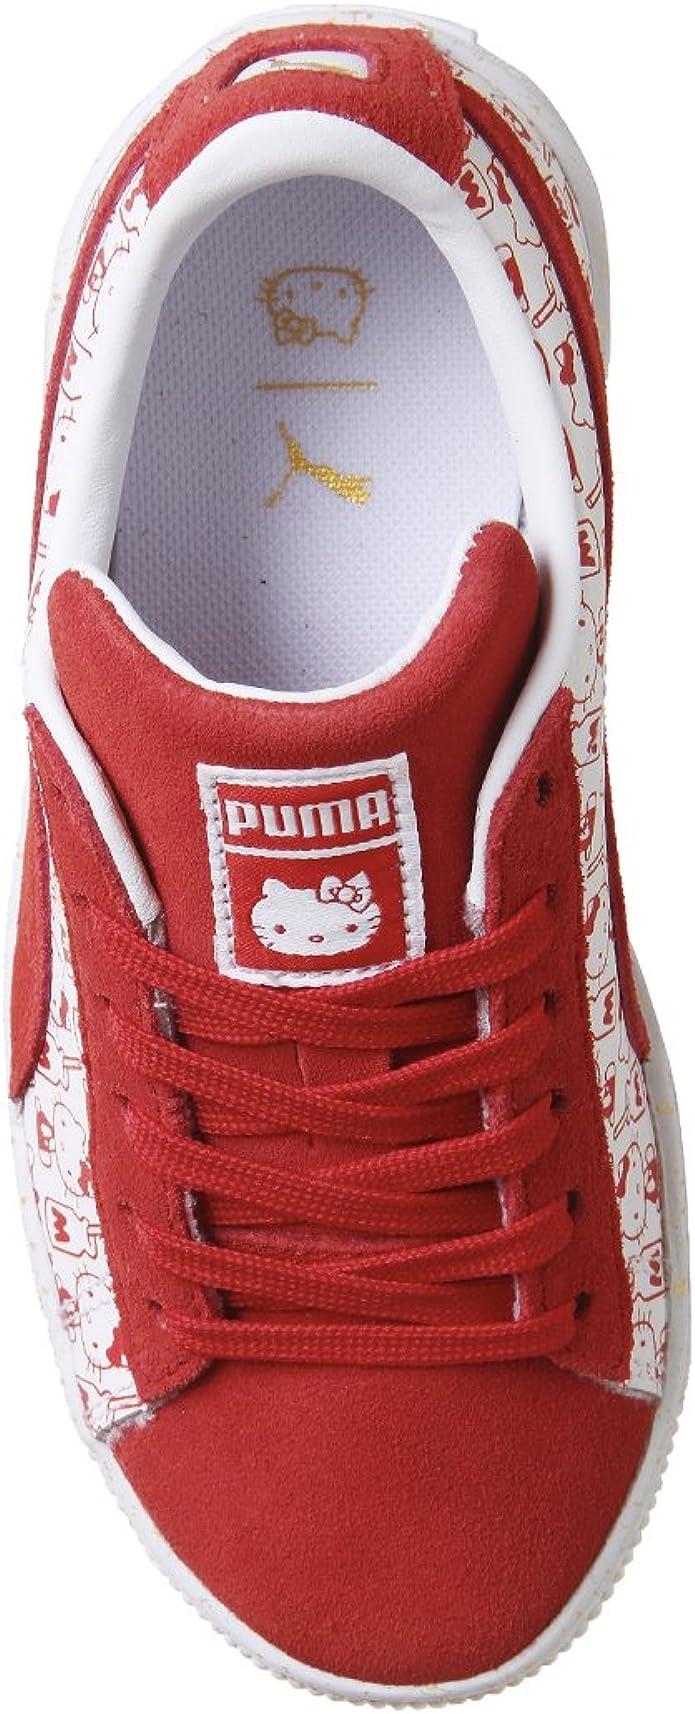 PUMA Suede Classic x Hello Kitty Chaussures de Sport pour